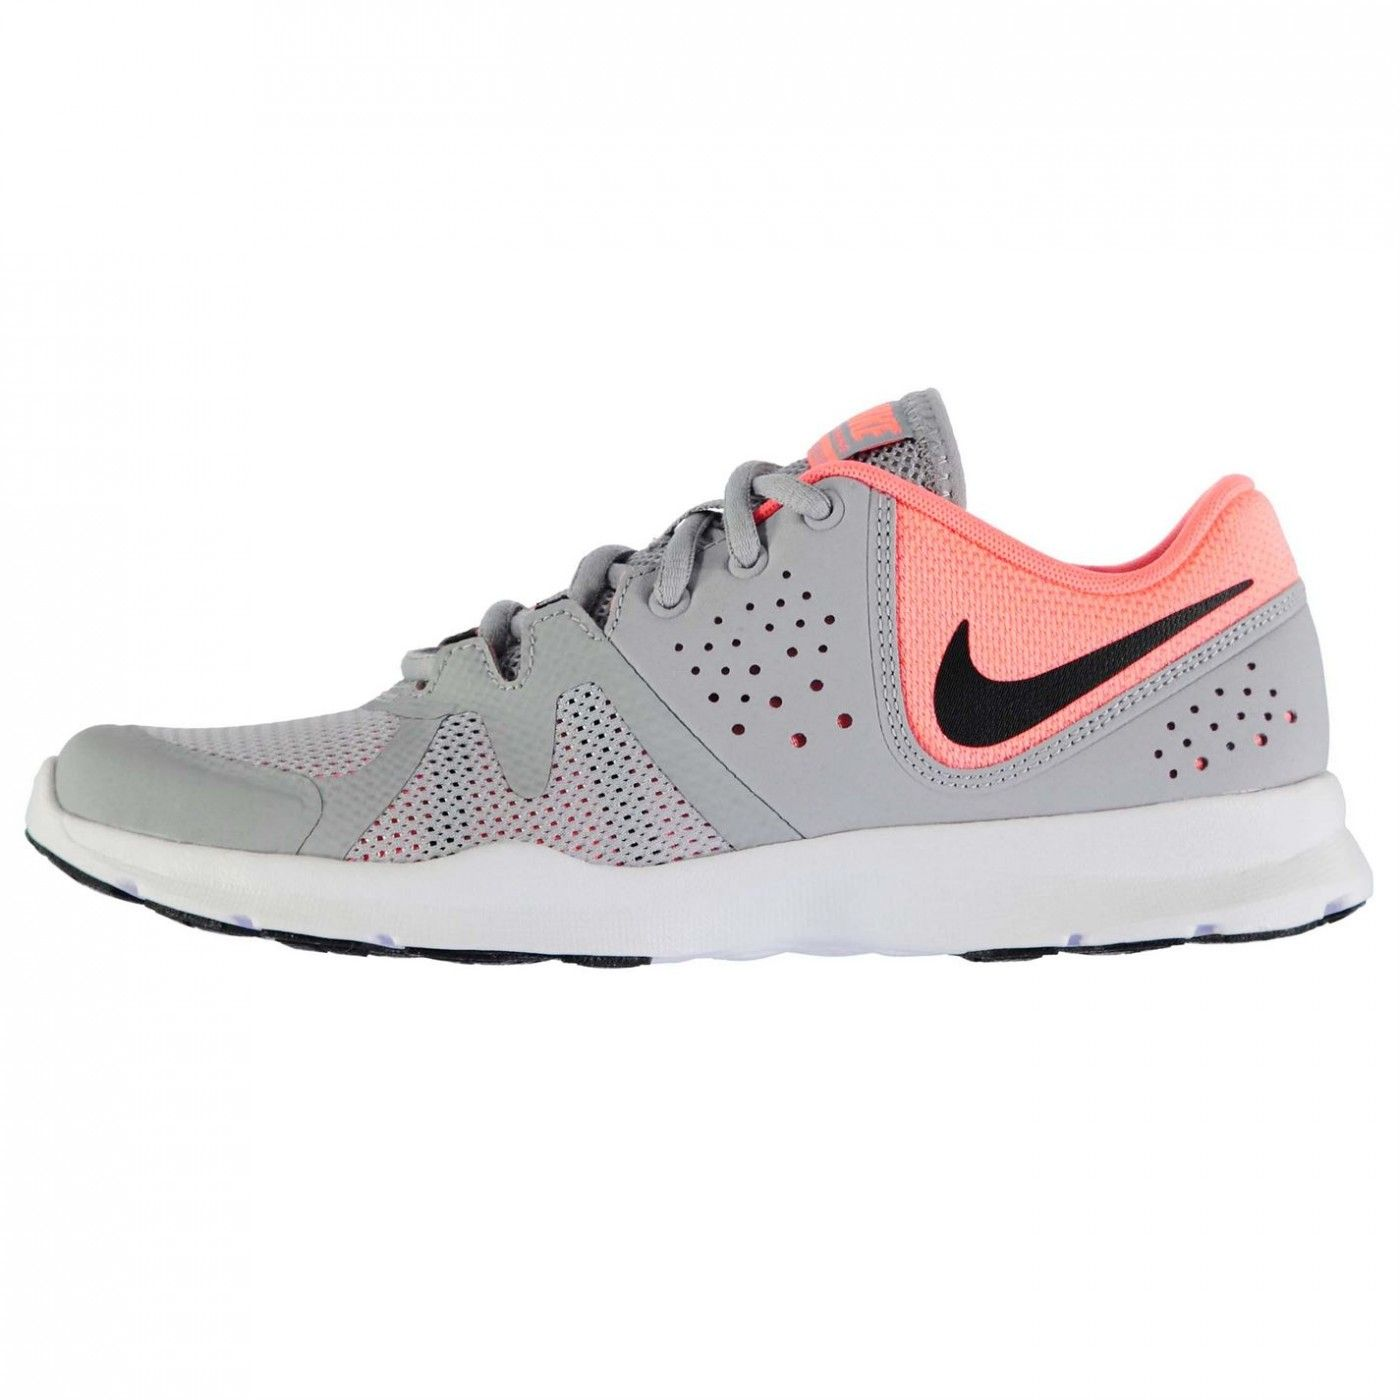 69940fac43cd0 Nike - Core Motion Mesh Trainers Ladies   boty